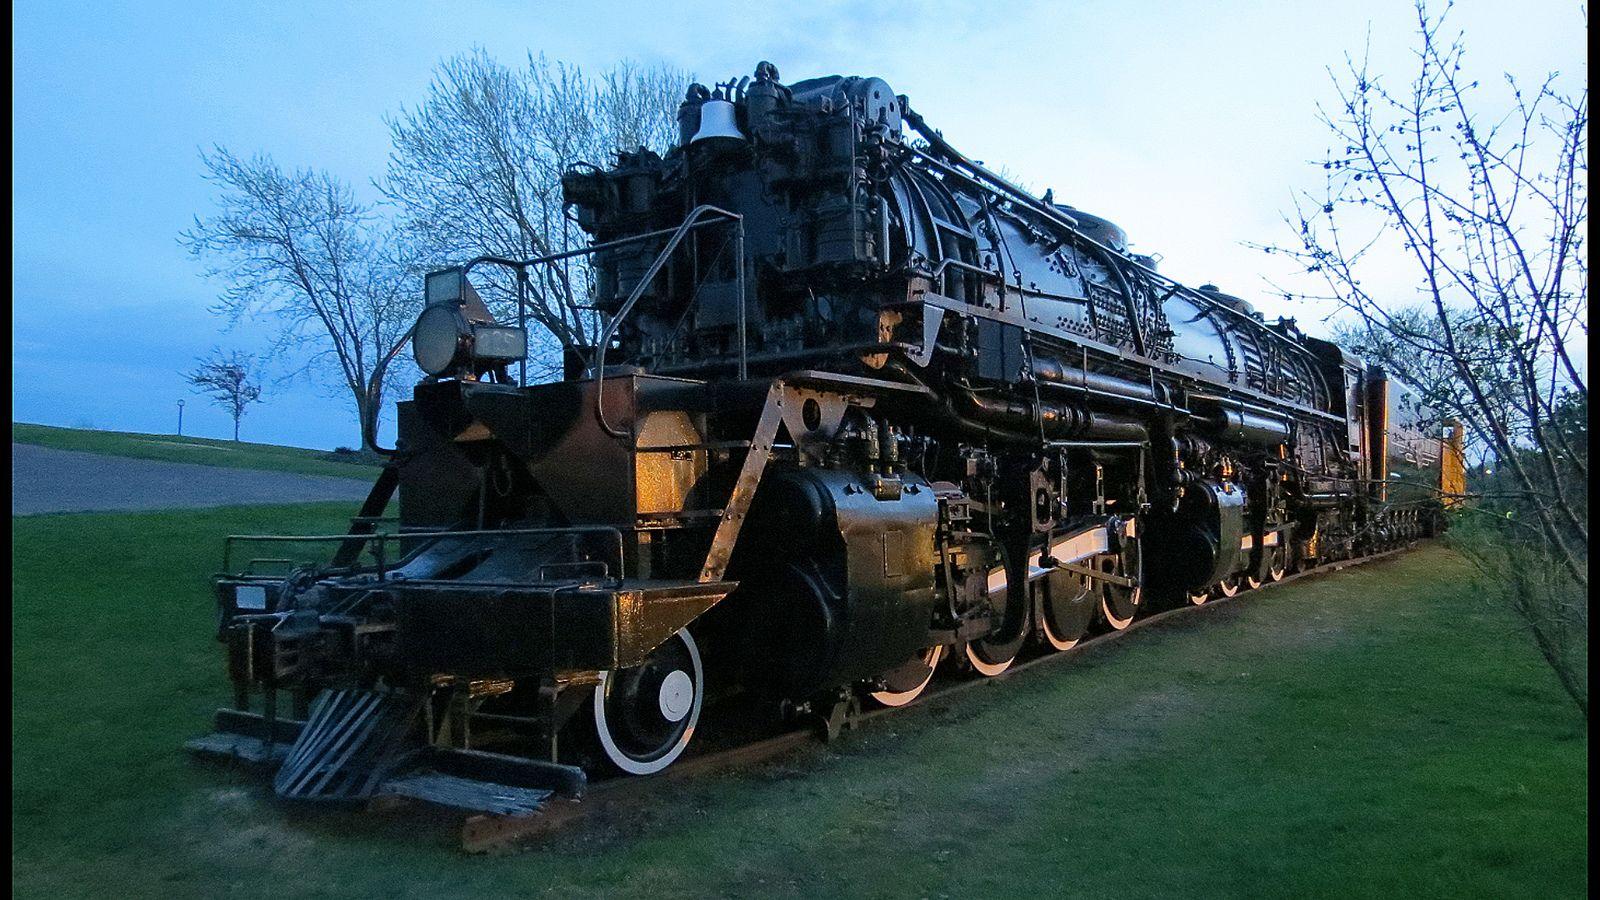 "https://flic.kr/p/ntQigL   Yellowstone Steam Locomotive DM&IR 225   The Yellowstone steam train on display in Proctor, Minnesota.  For a video:  <a href=""https://www.youtube.com/watch?v=twKPNgcHCVM"" rel=""nofollow"">www.youtube.com/watch?v=twKPNgcHCVM</a>"